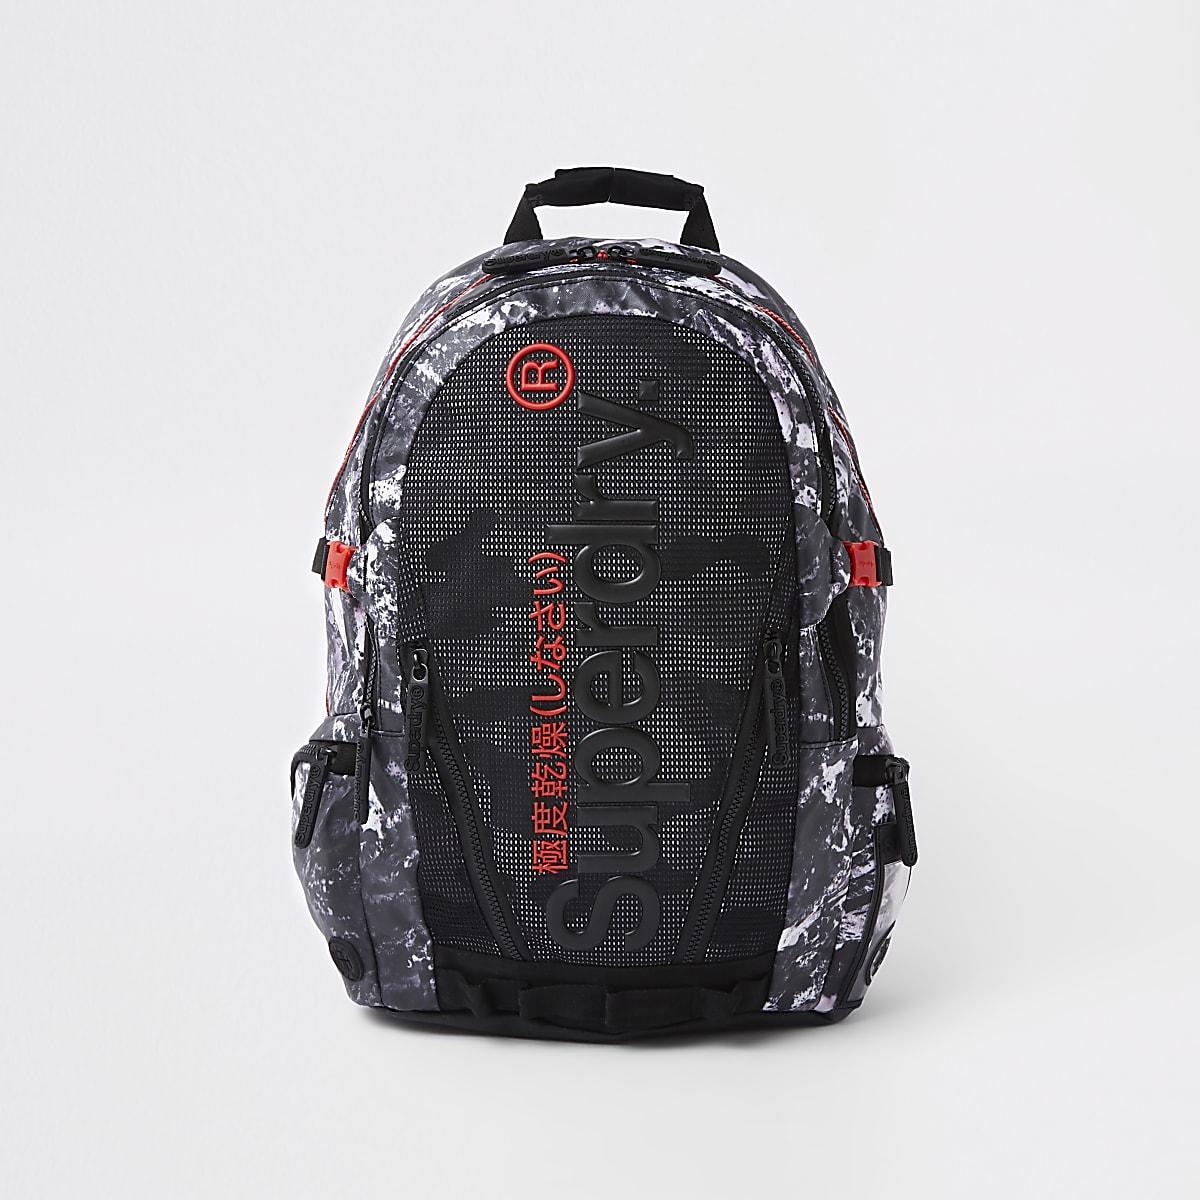 Superdry black mesh backpack